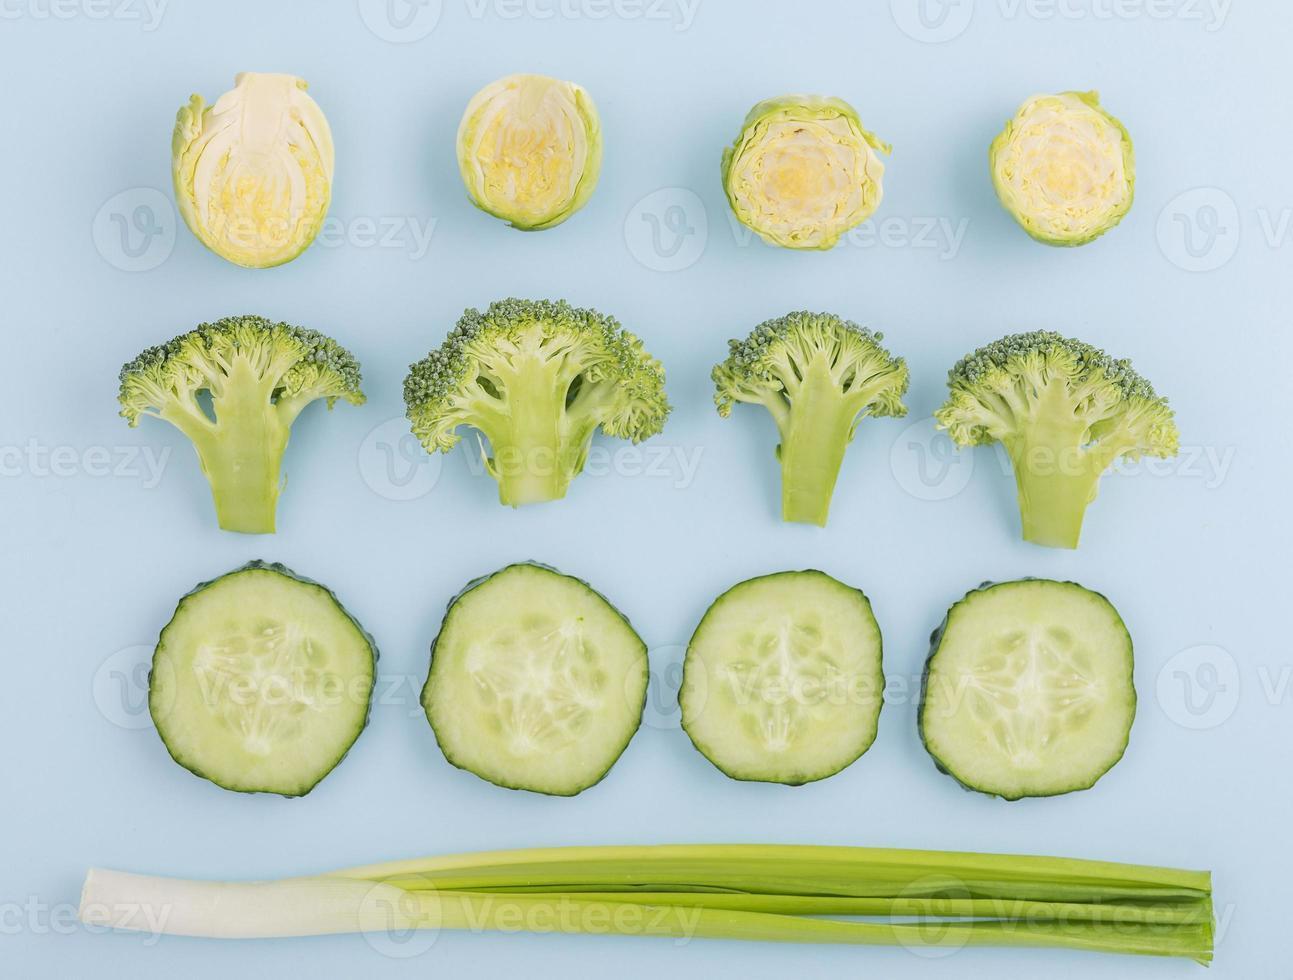 légumes bio sur la table photo